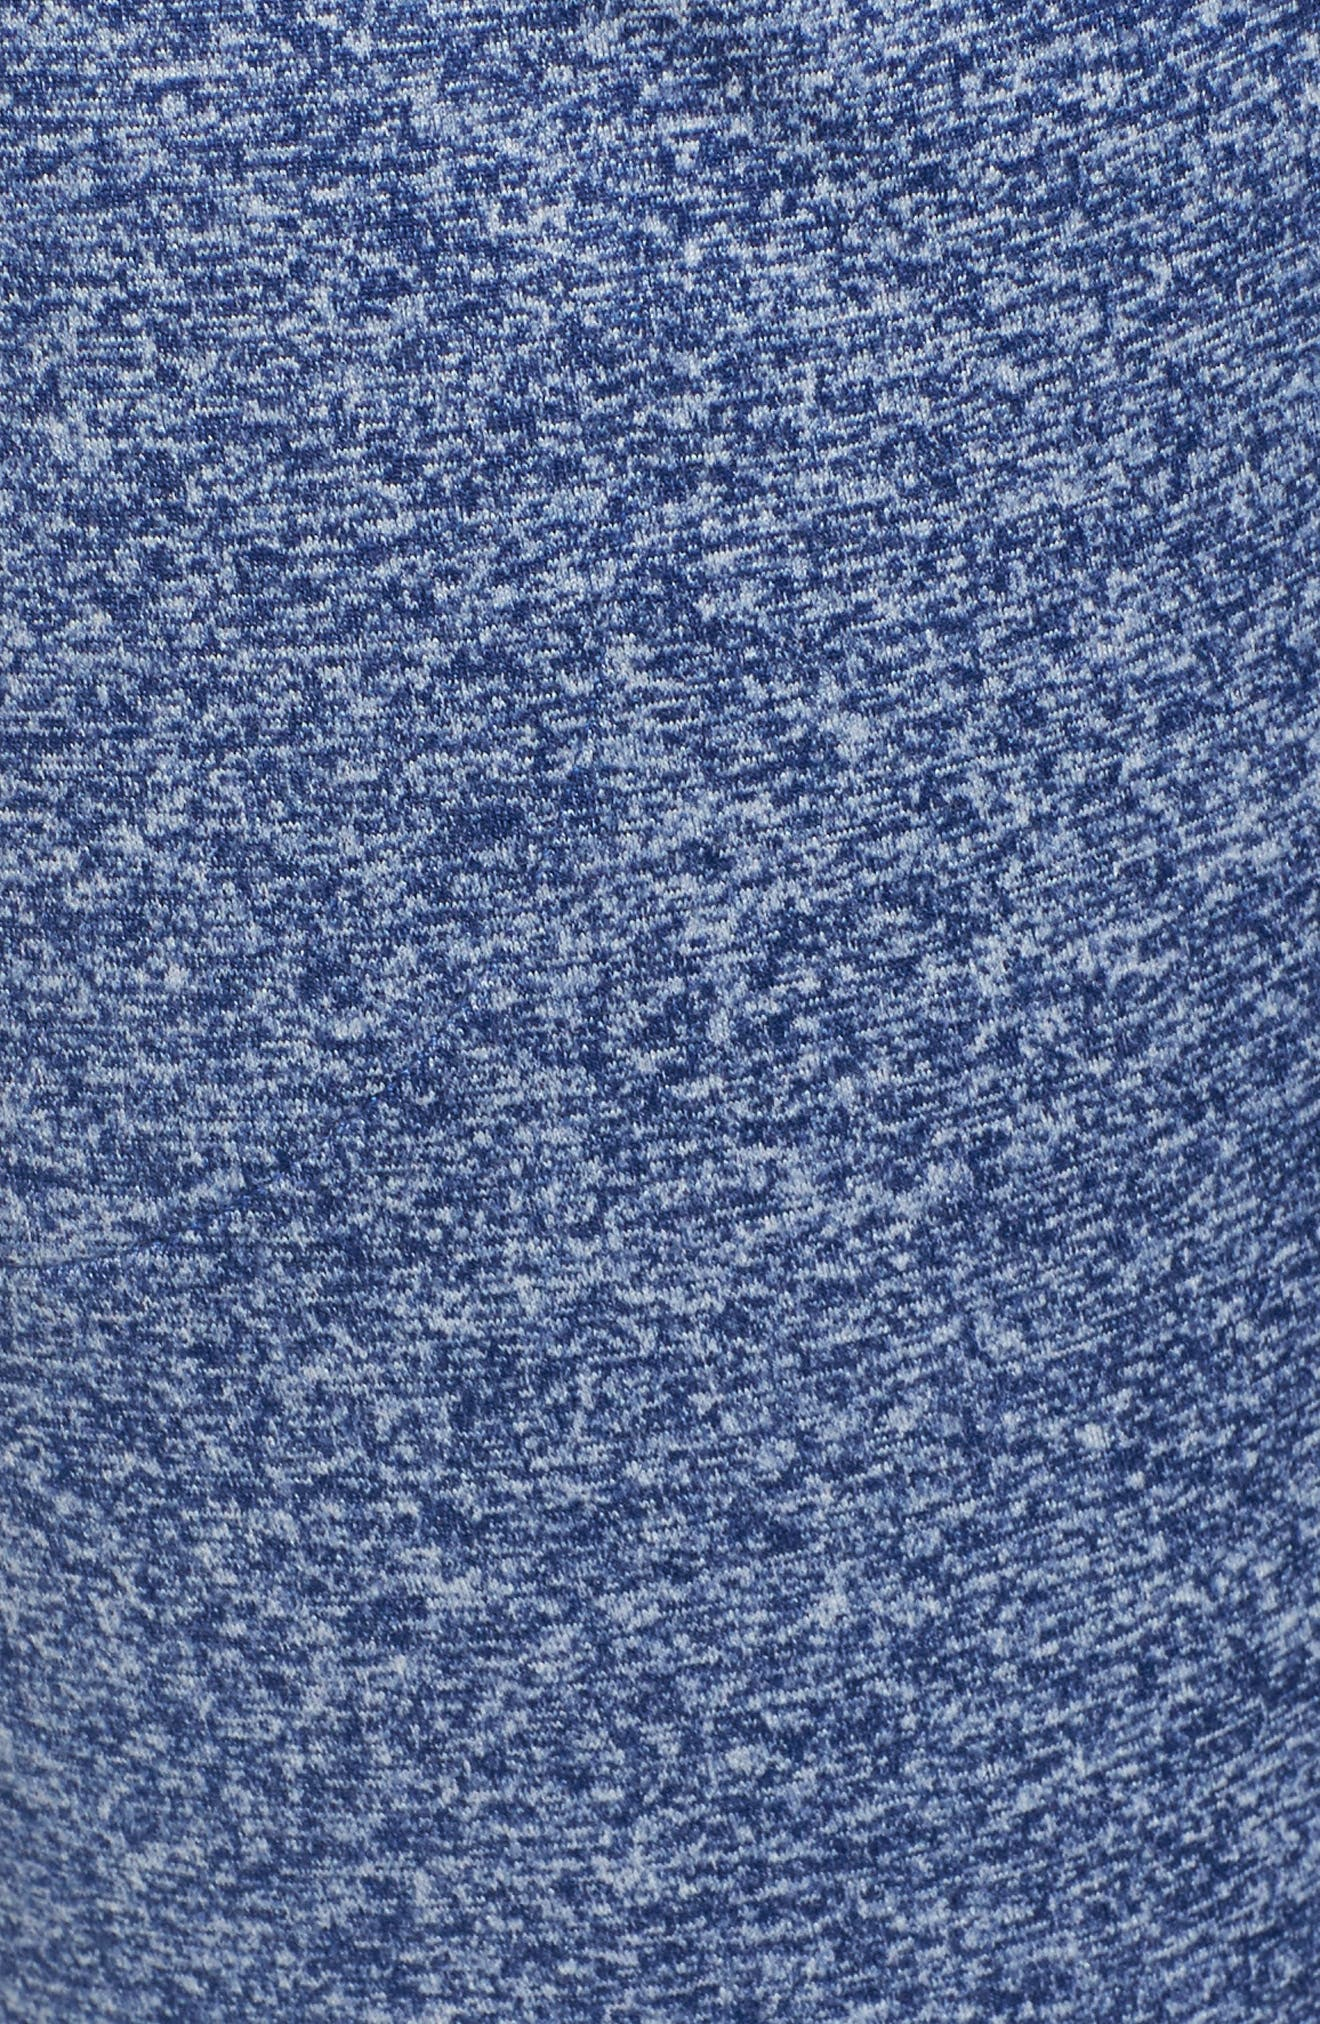 Taryn Sport Knit Pants,                             Alternate thumbnail 6, color,                             Blue Depths Melange